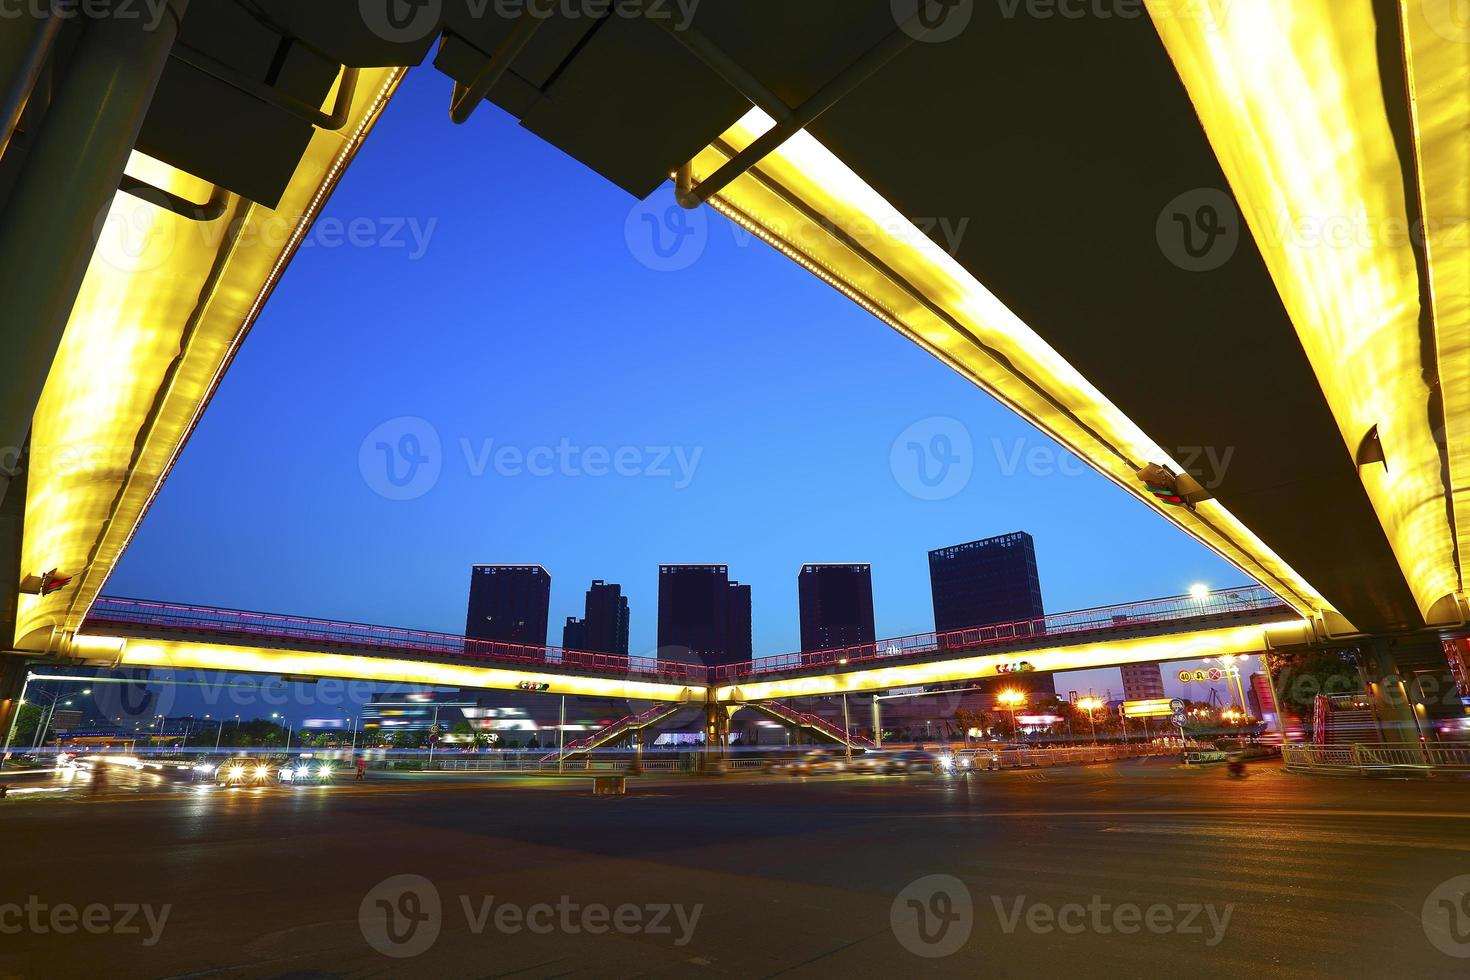 Urban footbridge and road intersection of night scene photo